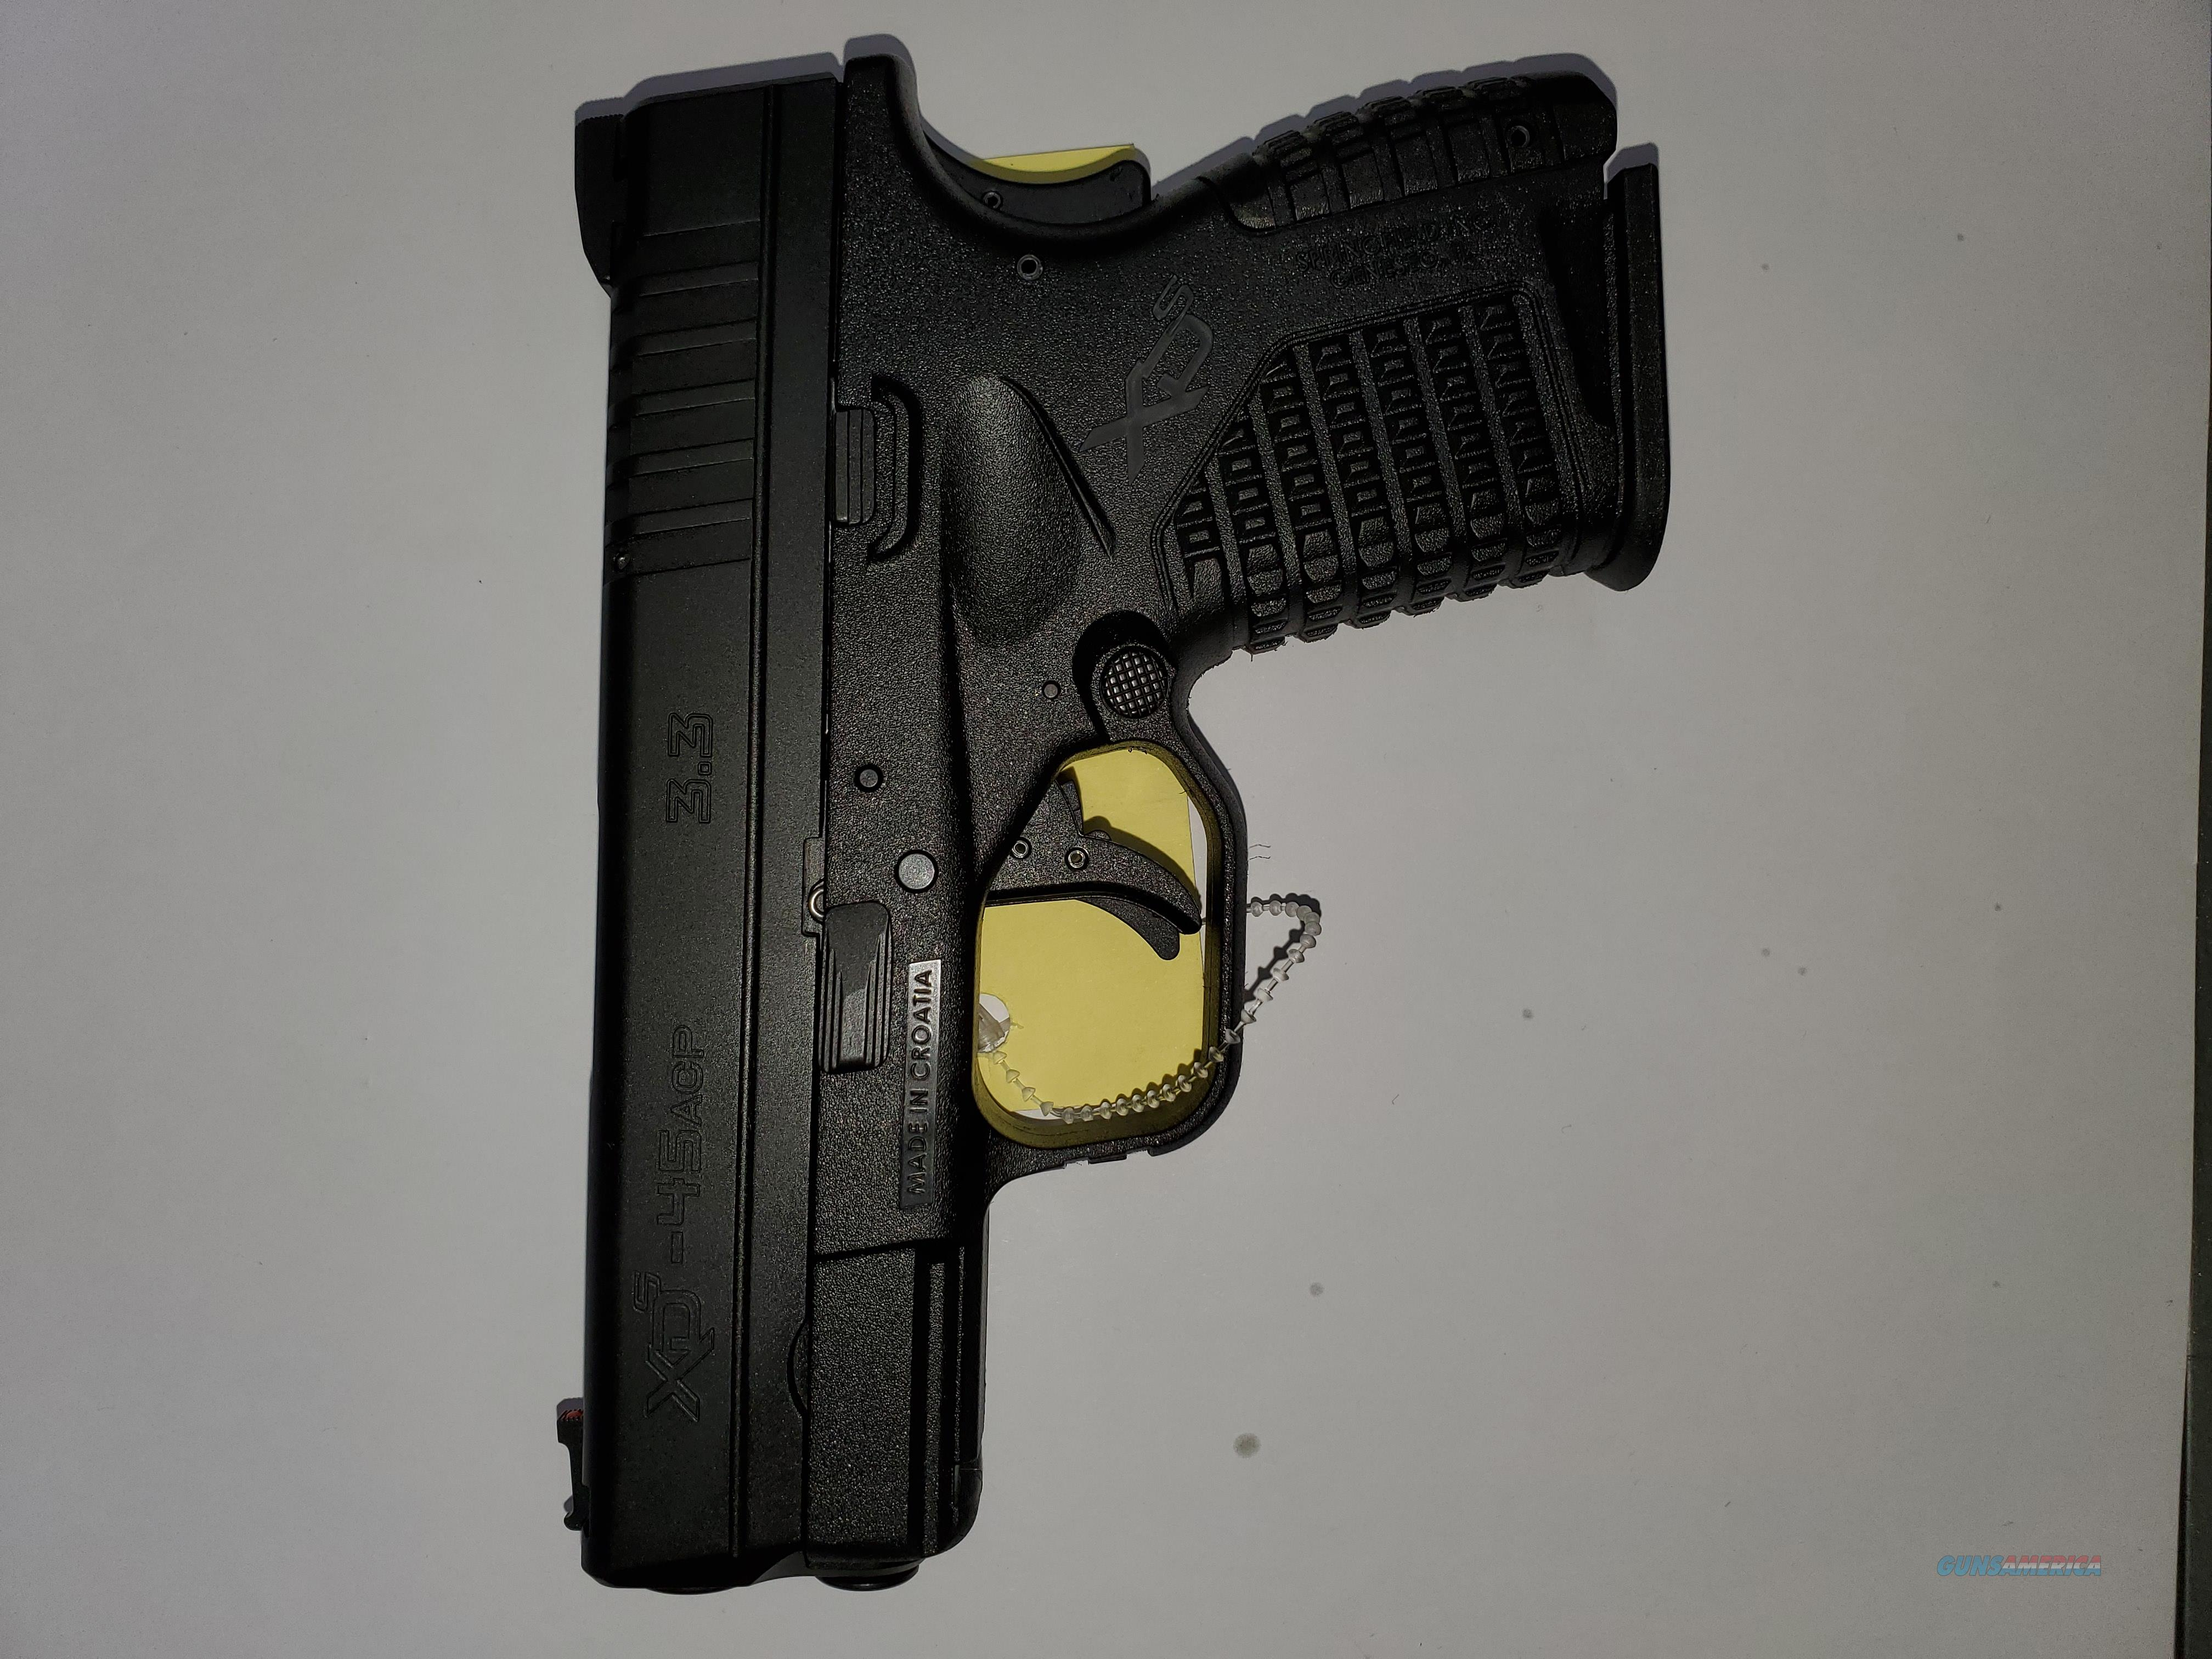 Springfield xd-s 45  Guns > Pistols > Springfield Armory Pistols > XD-S